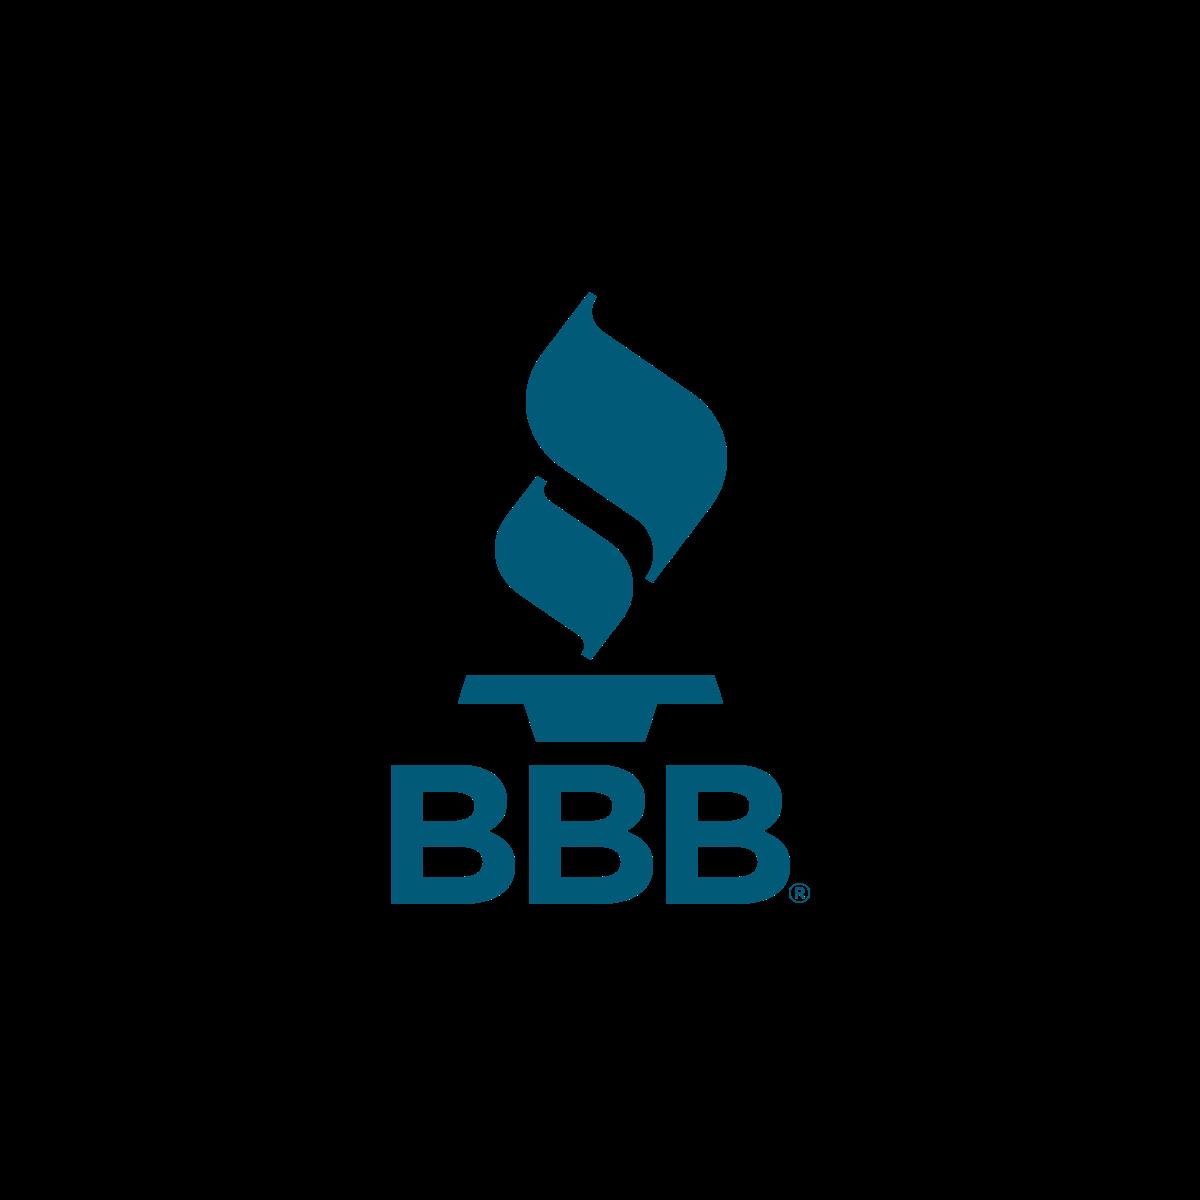 bbb logo_square.png